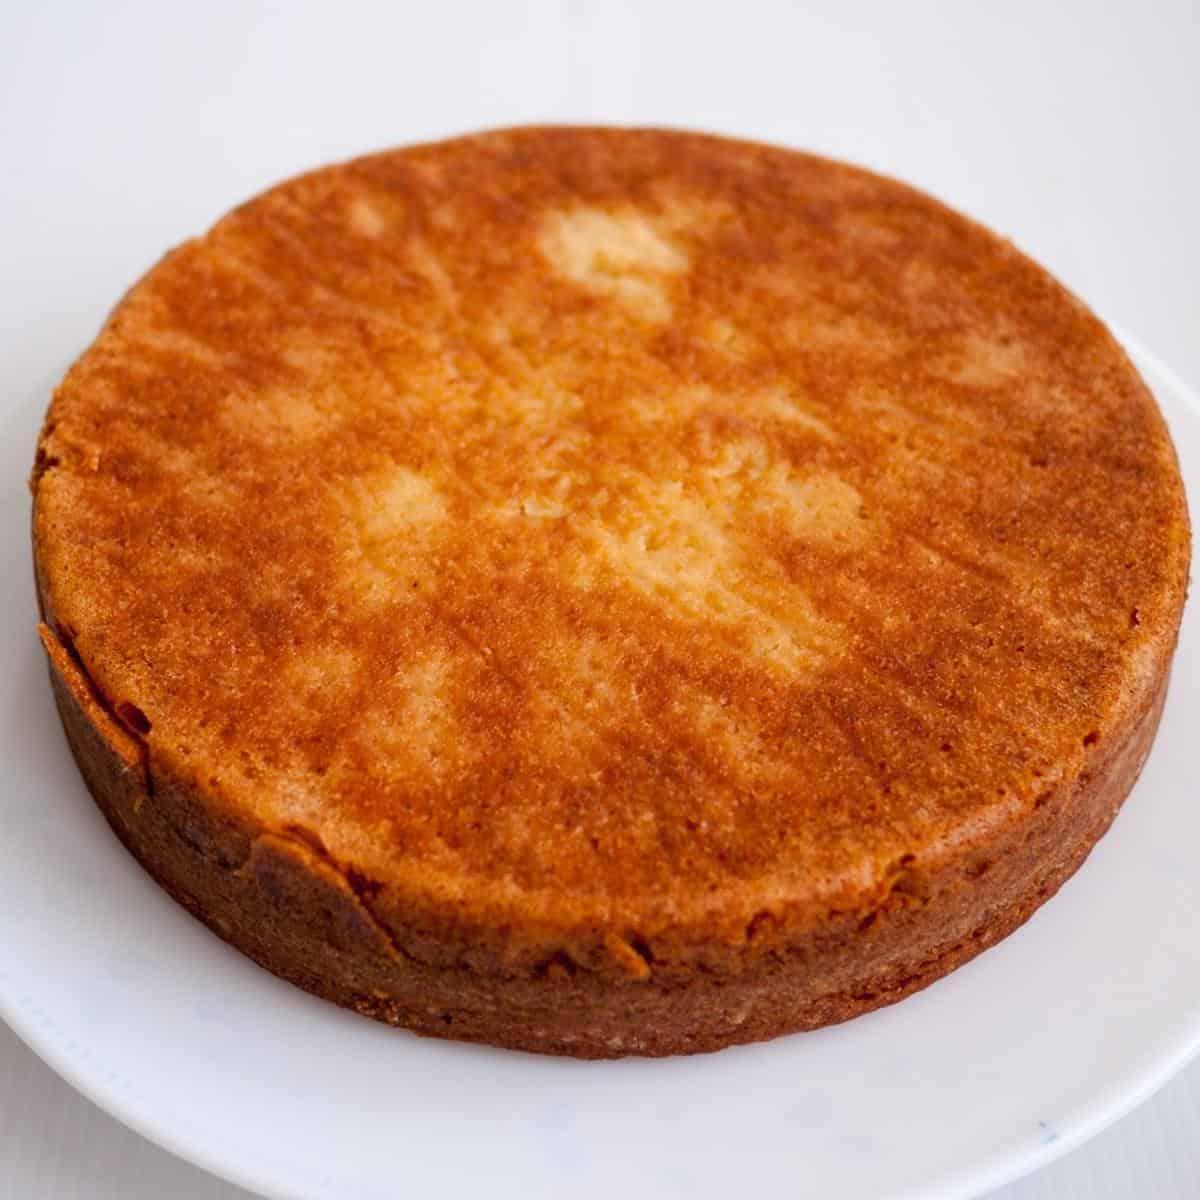 A vanilla cake.